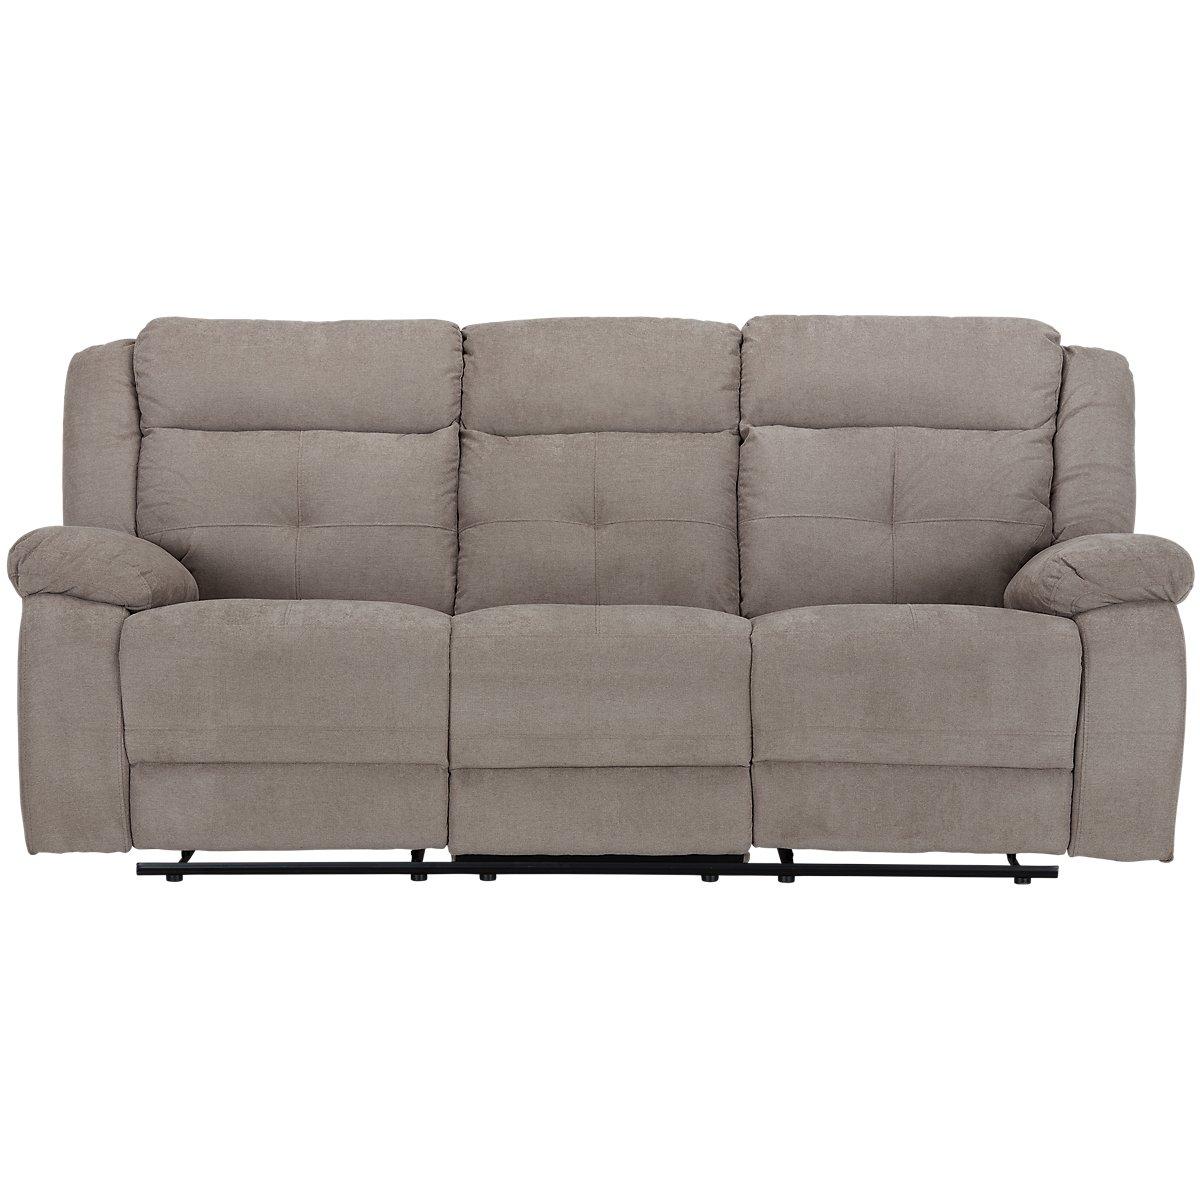 City Furniture Pierce Taupe Microfiber Reclining Sofa